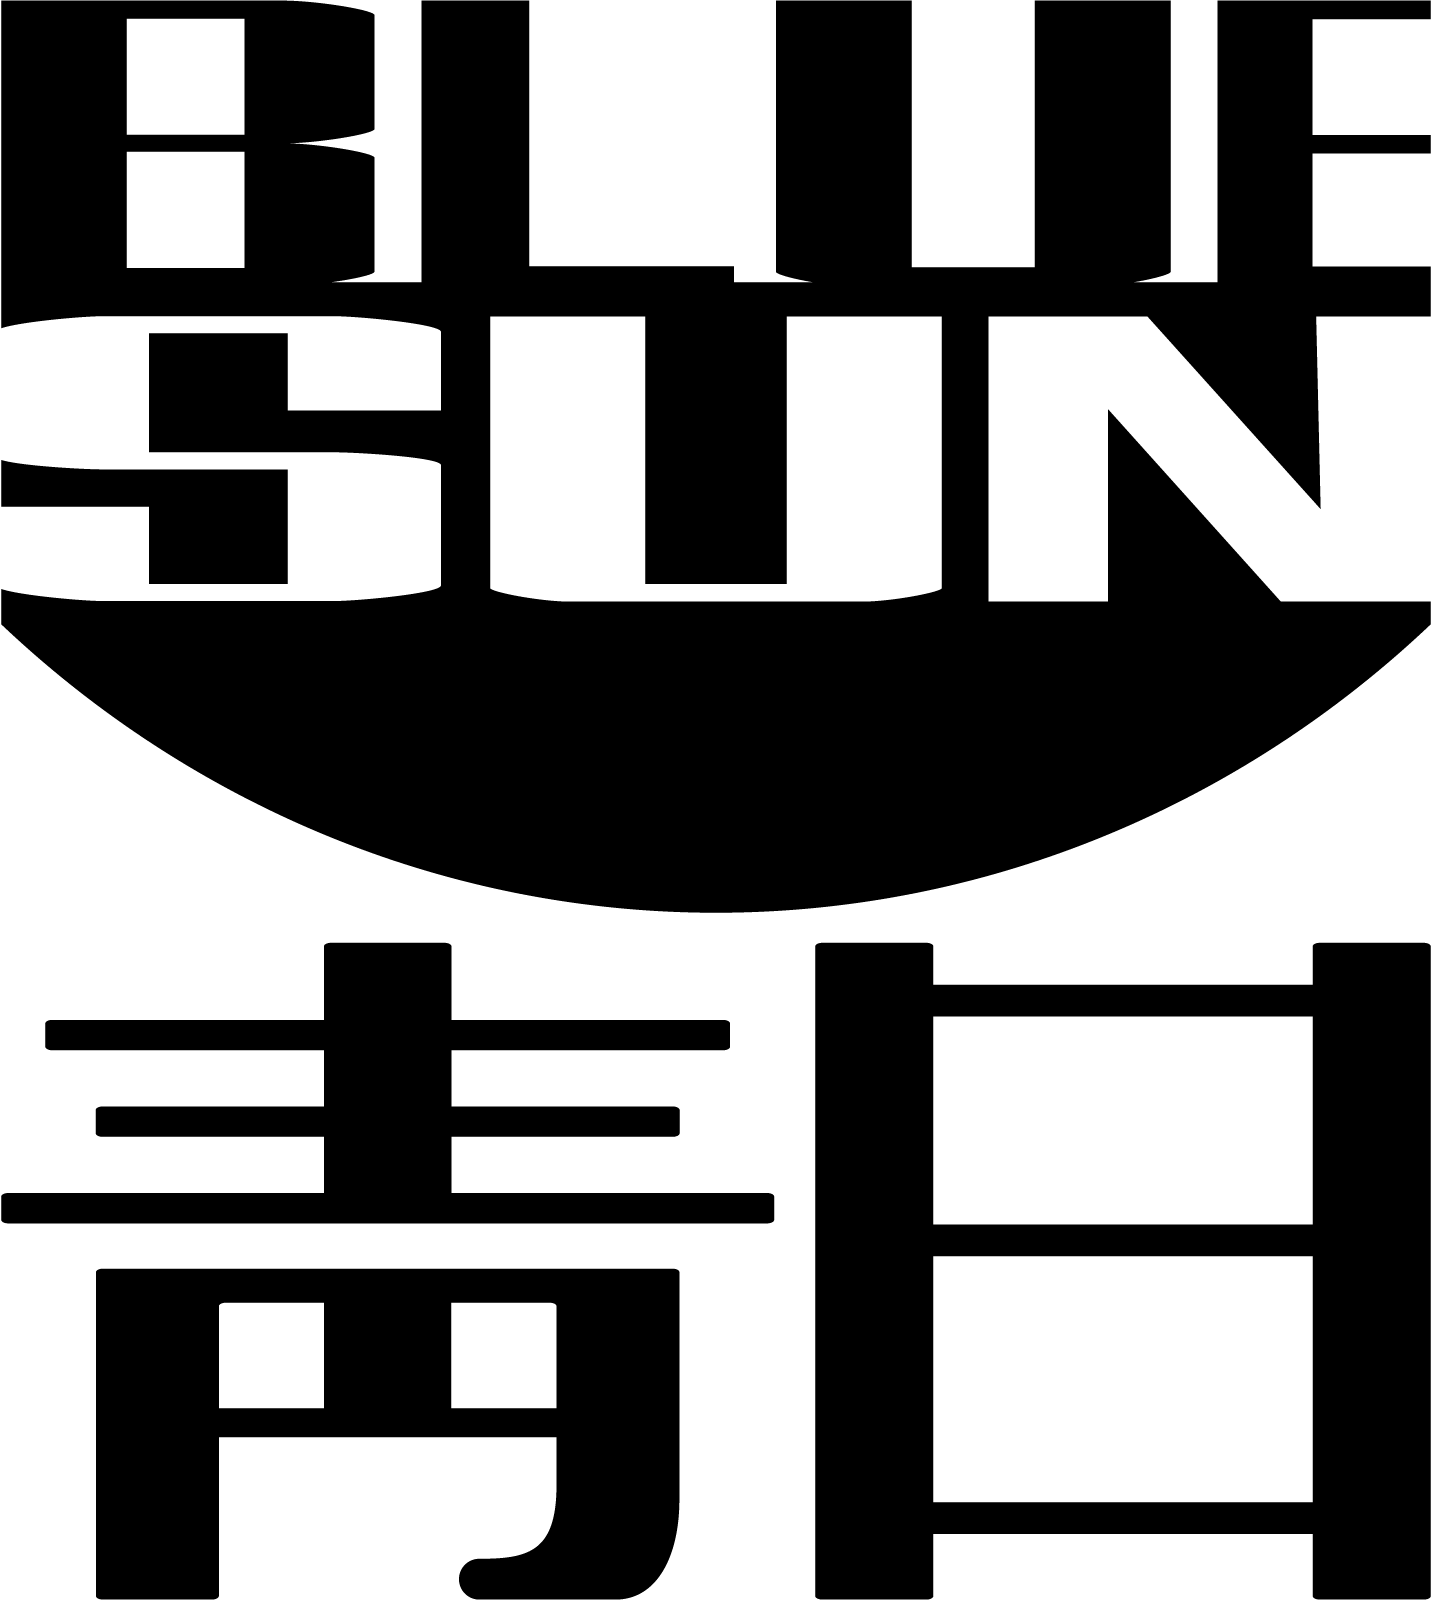 Firefly clipart vector. Xaonon graphics